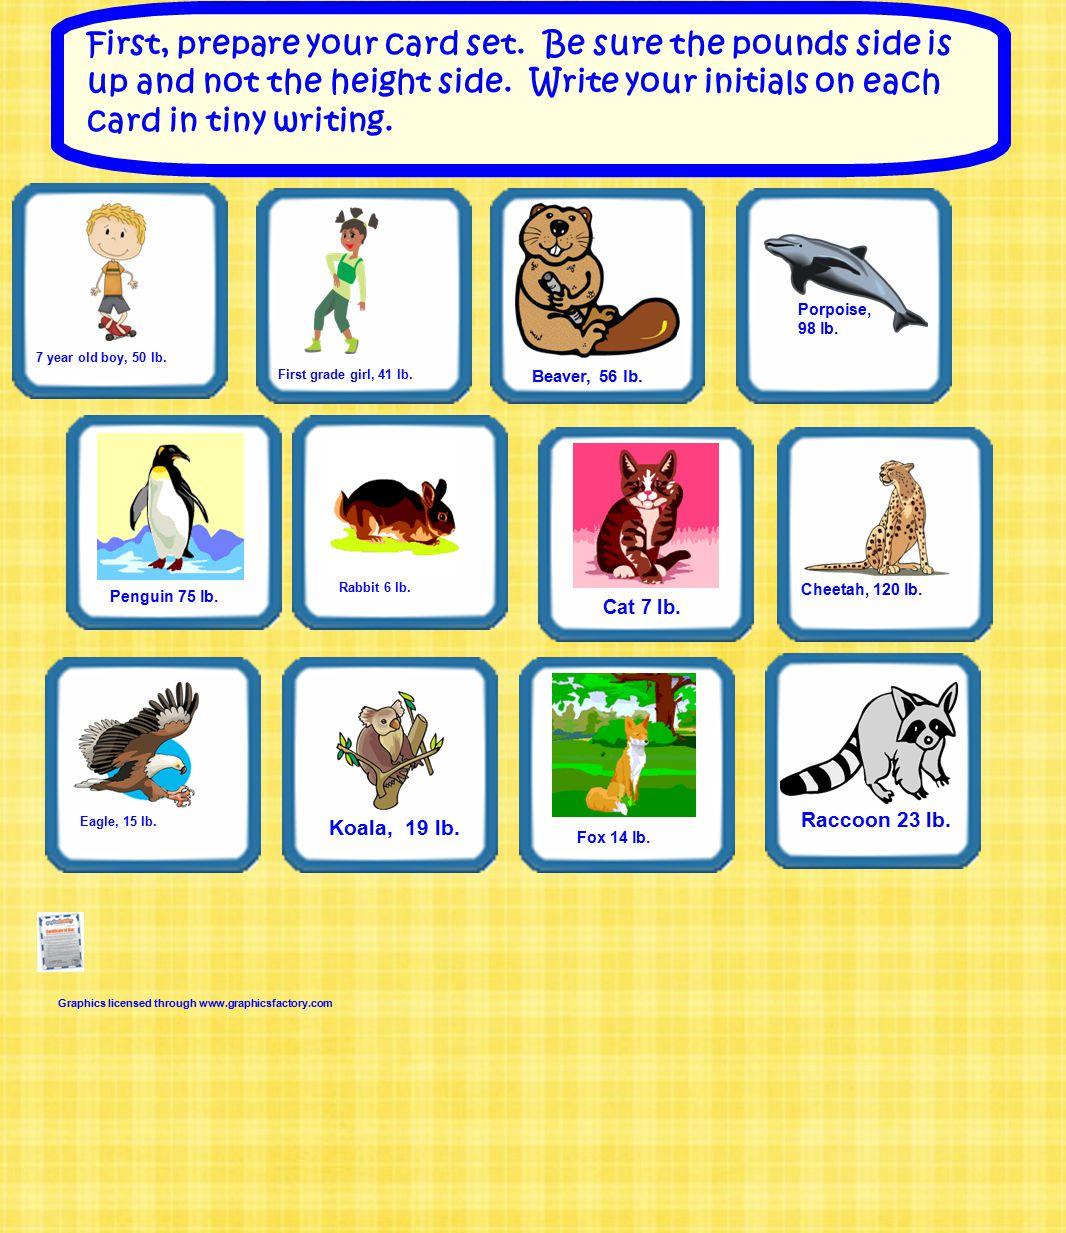 math worksheet : everyday math 1st grade unit 6 review  math practice solved  : Everyday Math Worksheets